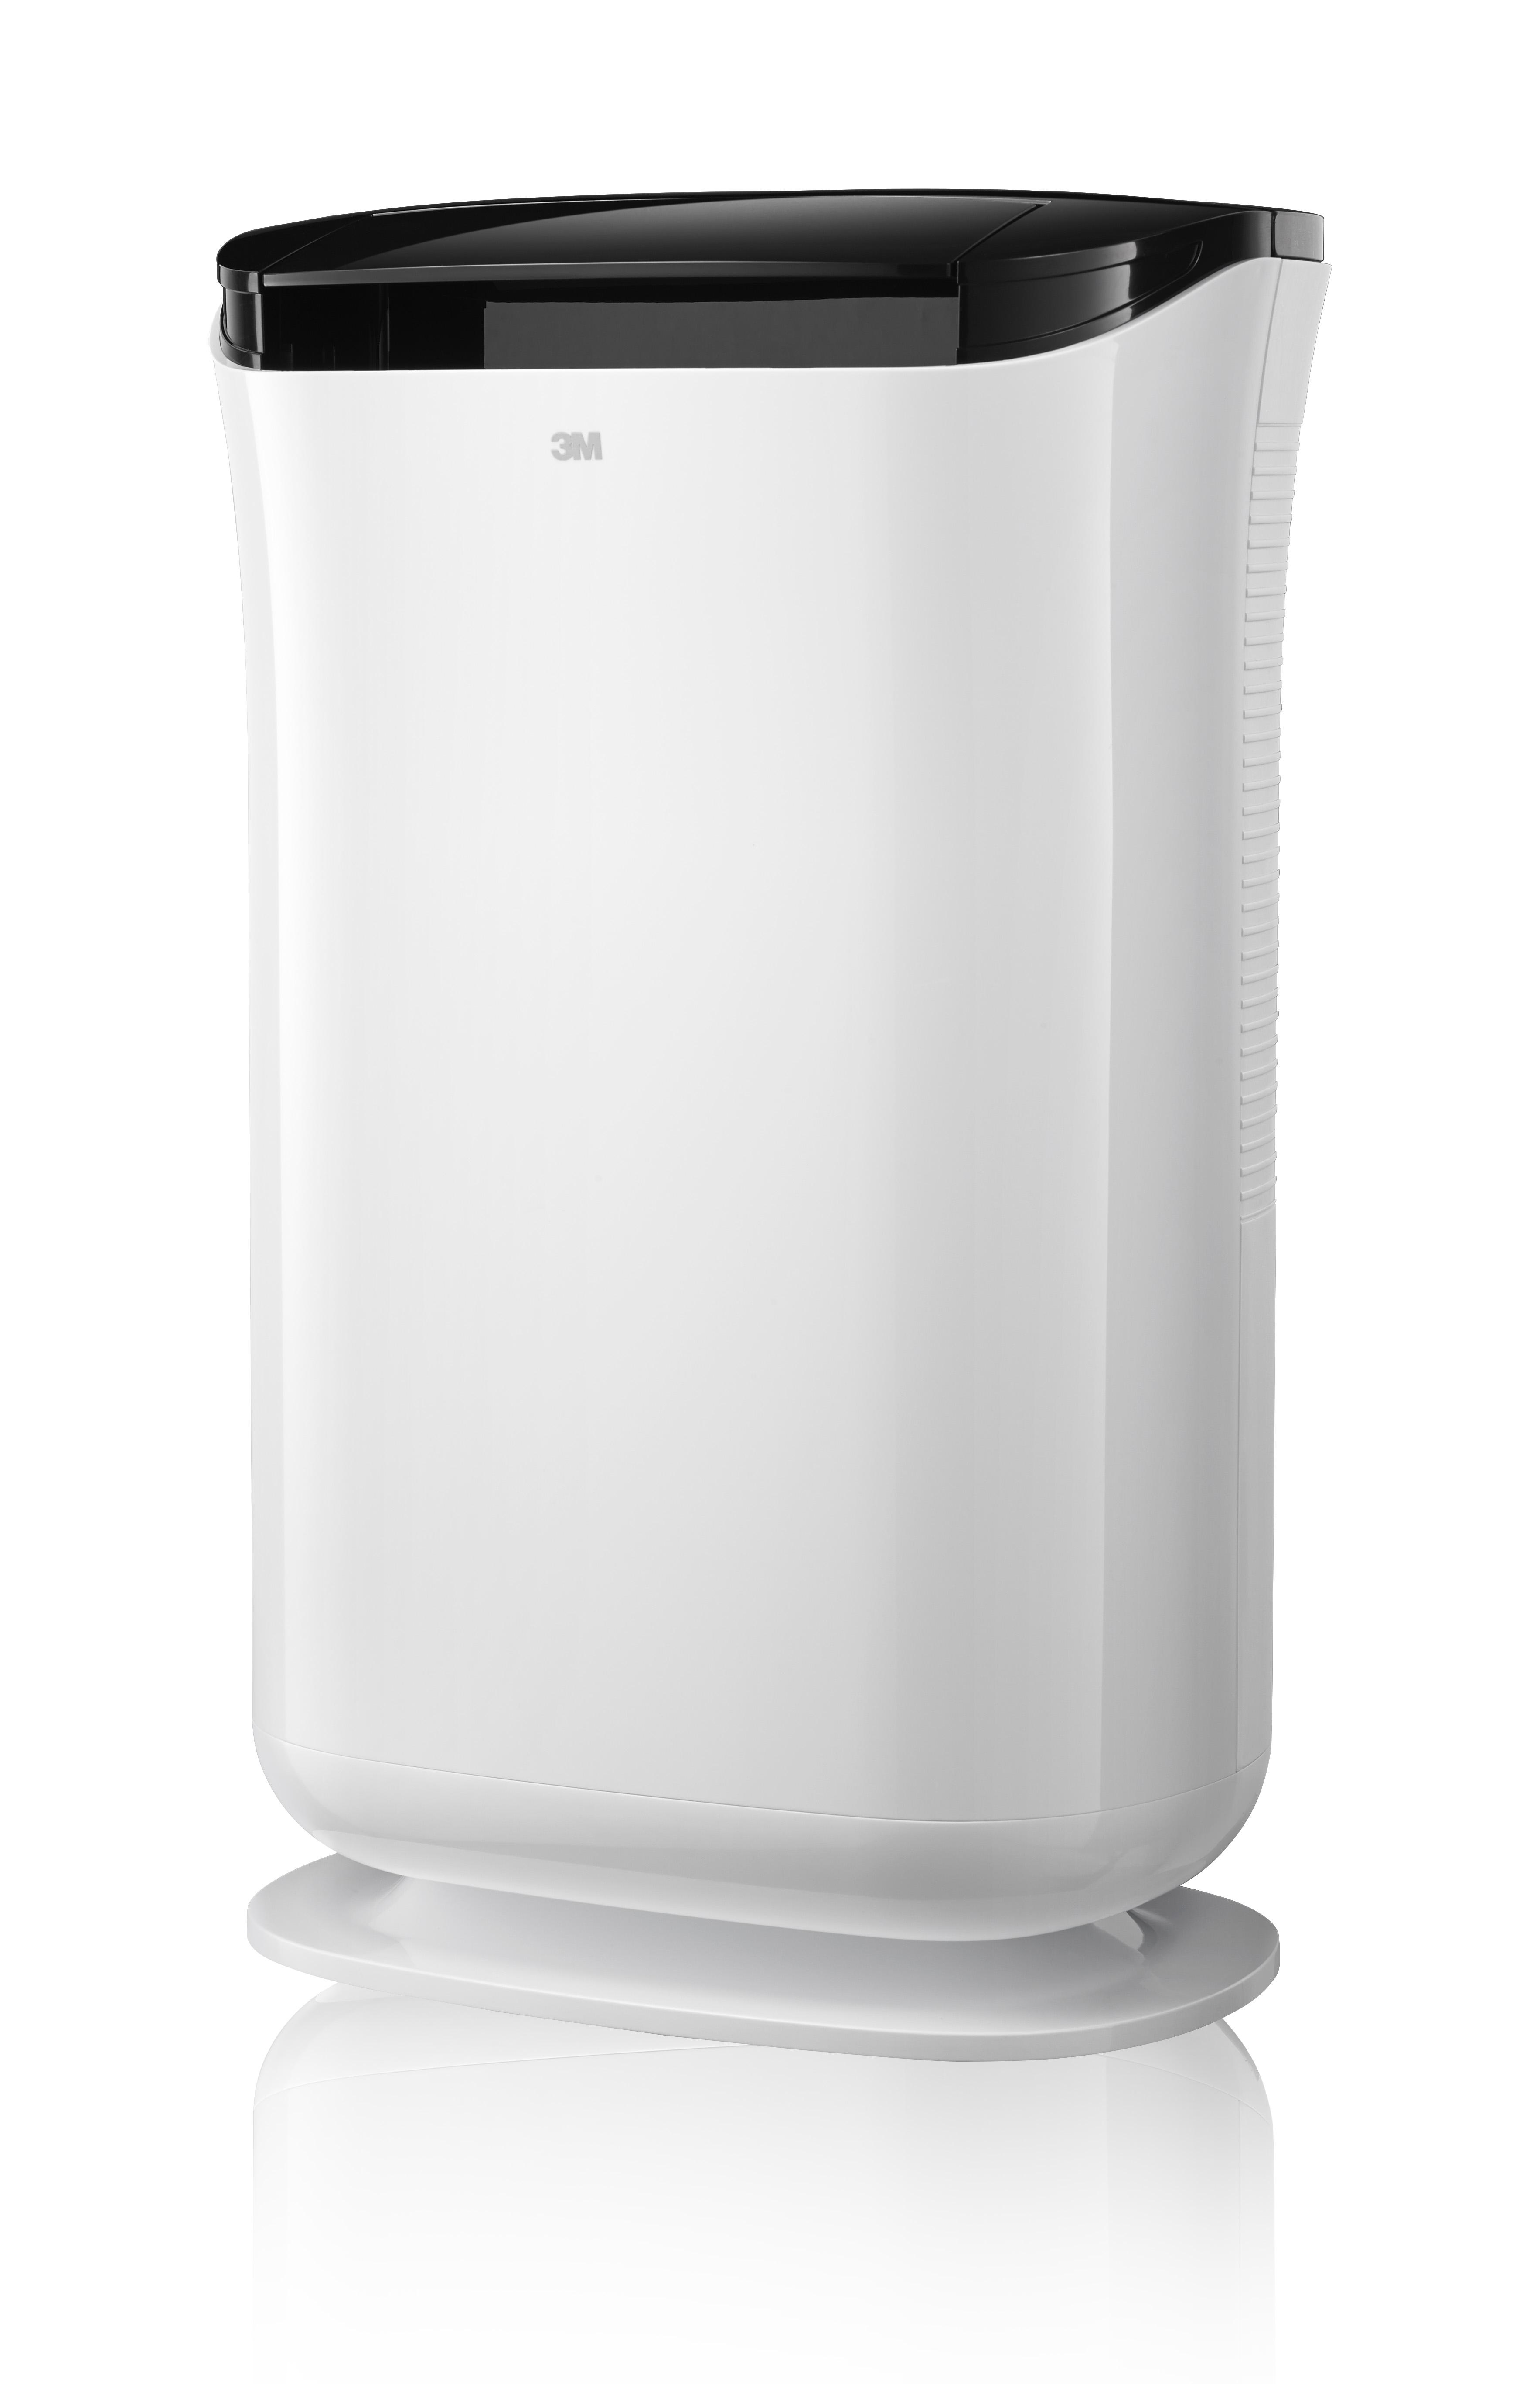 3M 雙效空氣清淨 除濕機 FD-A90W +專用濾網1片